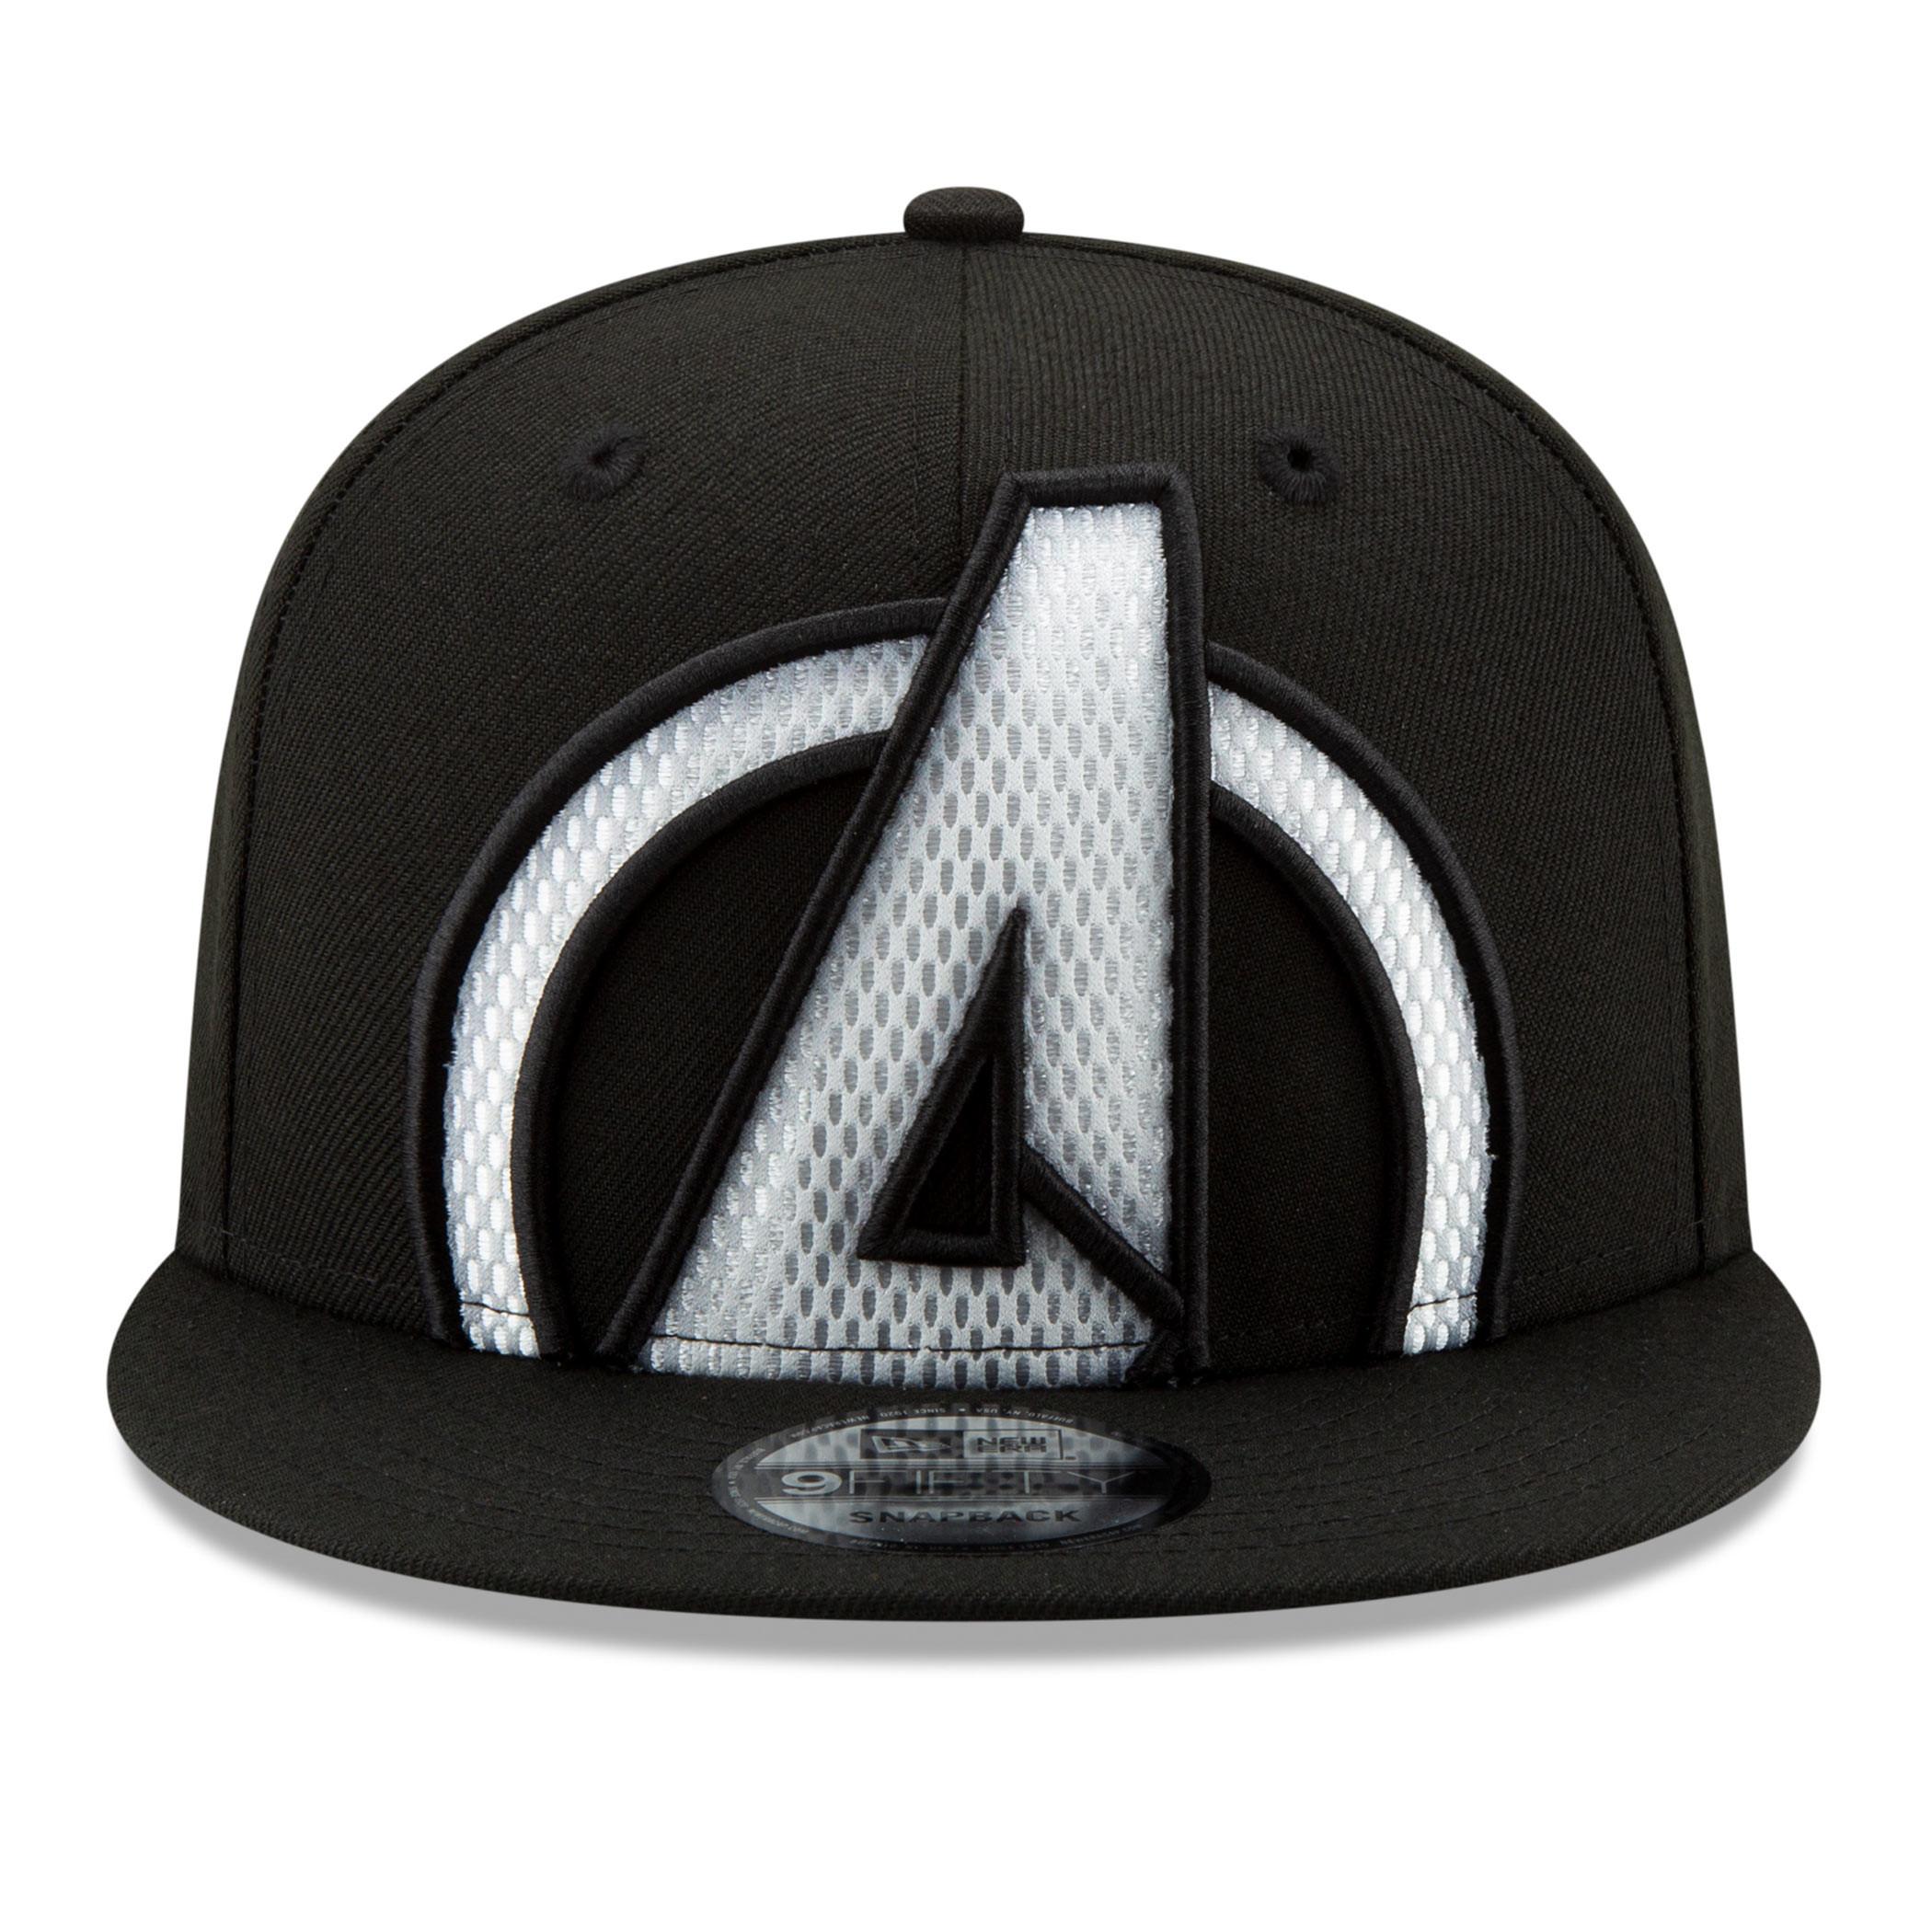 Avengers Symbol Color Trim New Era 9Fifty Adjustable Hat